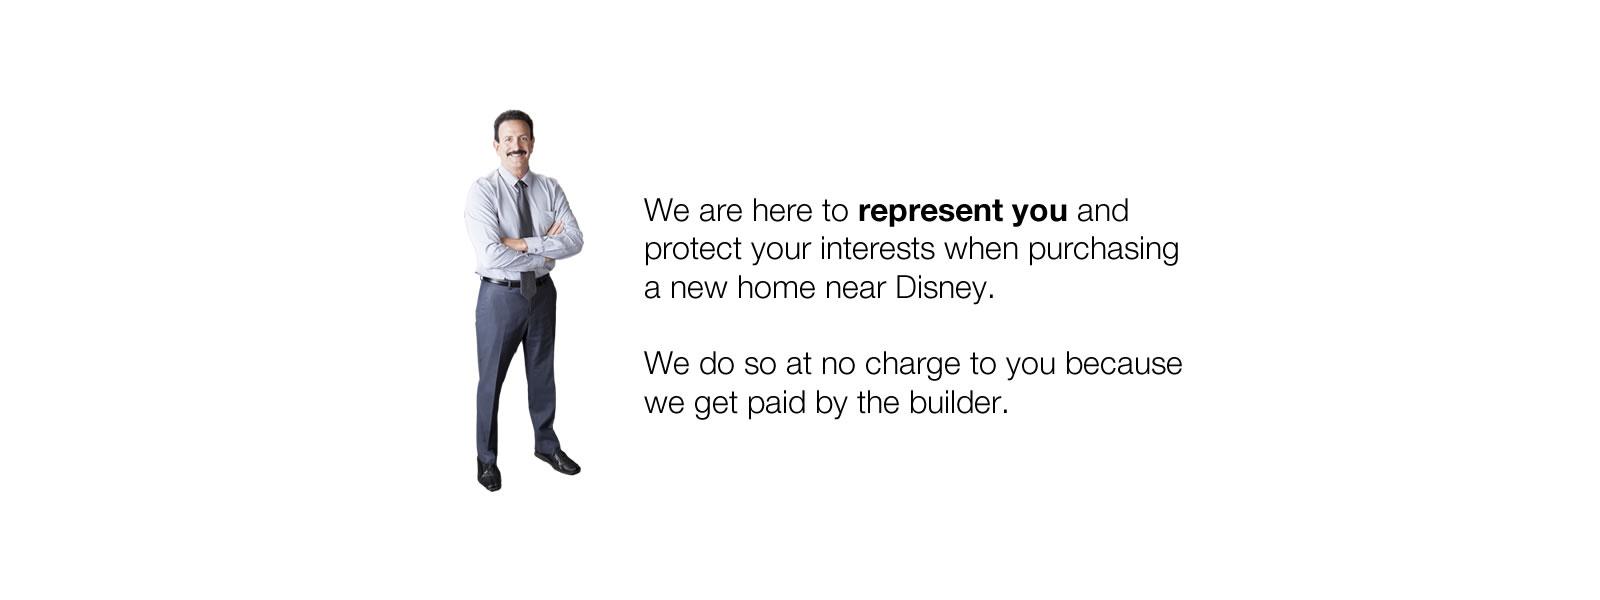 Solara at Westside. Get representation from Buy Orlando Properties